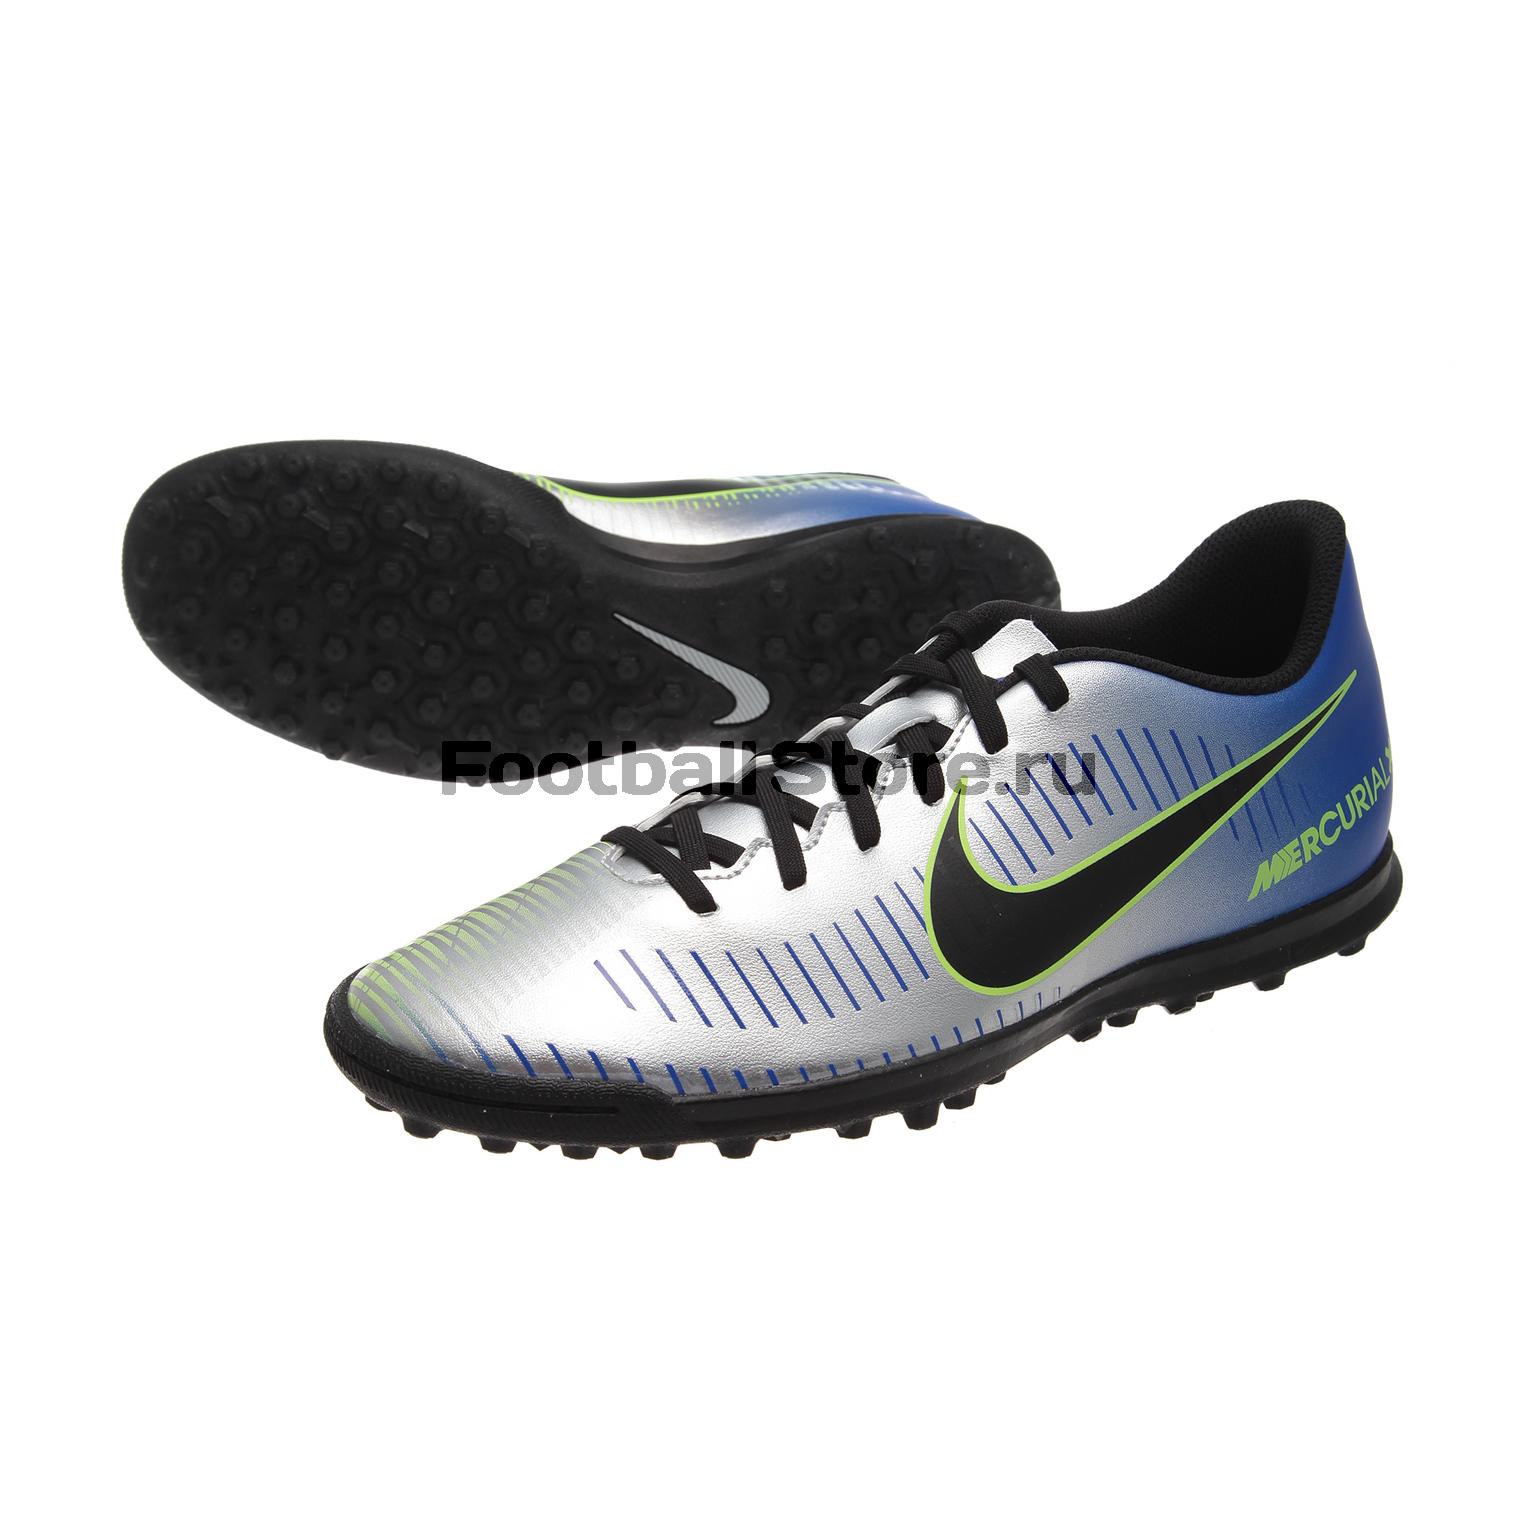 Шиповки Nike Mercurial Vortex III Neymar TF 921519-407 бутсы nike jr mercurial vortex iii njr fg 921490 407